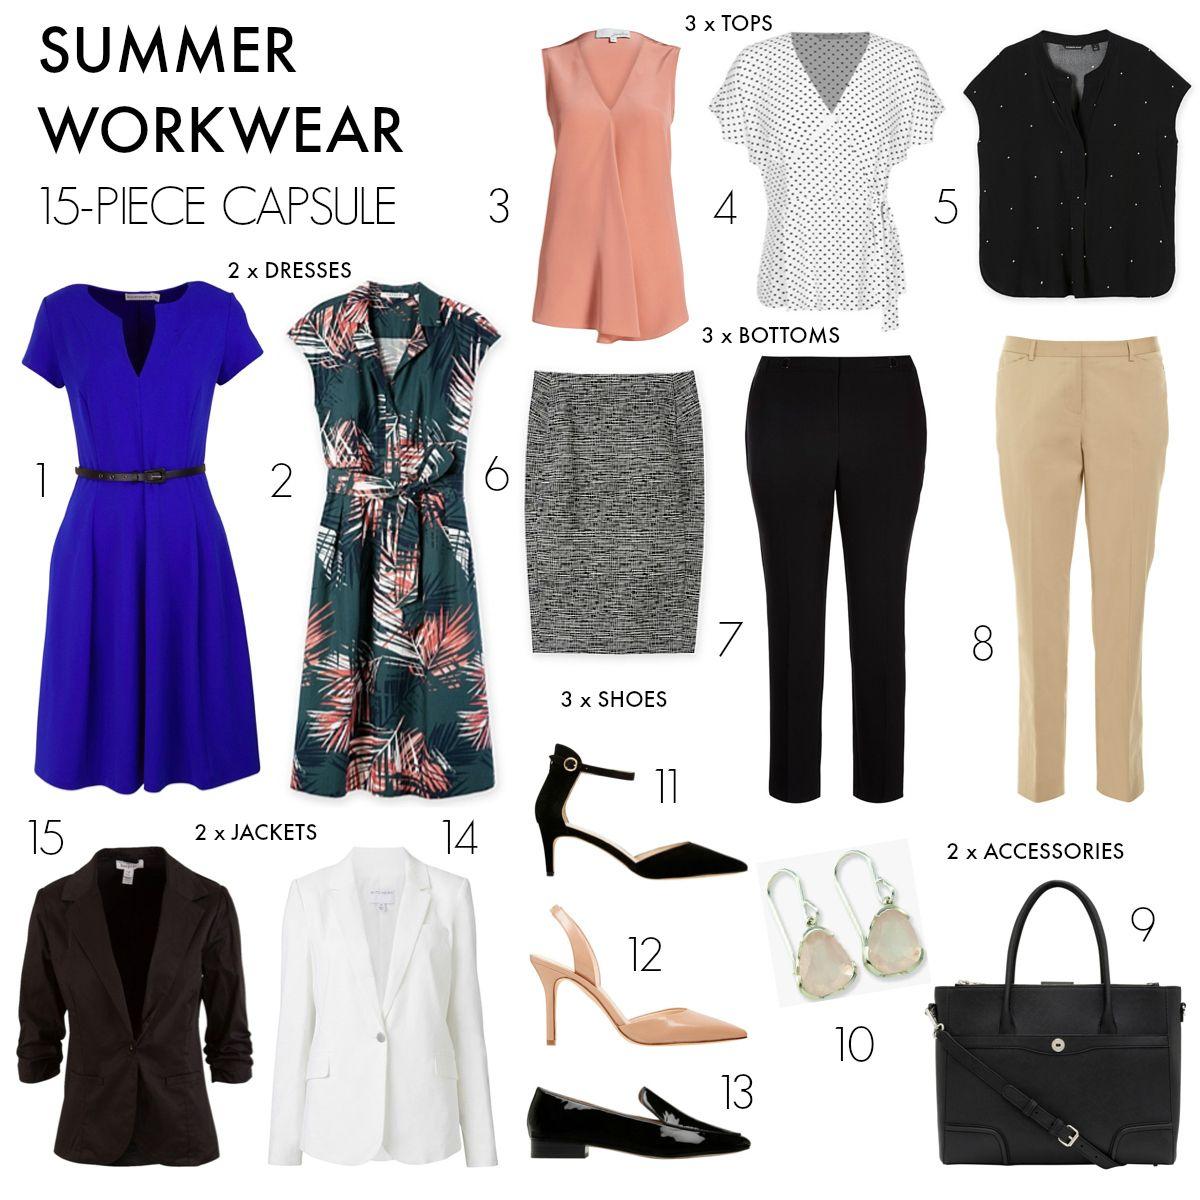 How To Create A 15 Piece Summer Workwear Capsule Wardrobe Workwear Capsule Wardrobe Capsule Wardrobe Mom Workwear Capsule [ 1200 x 1200 Pixel ]